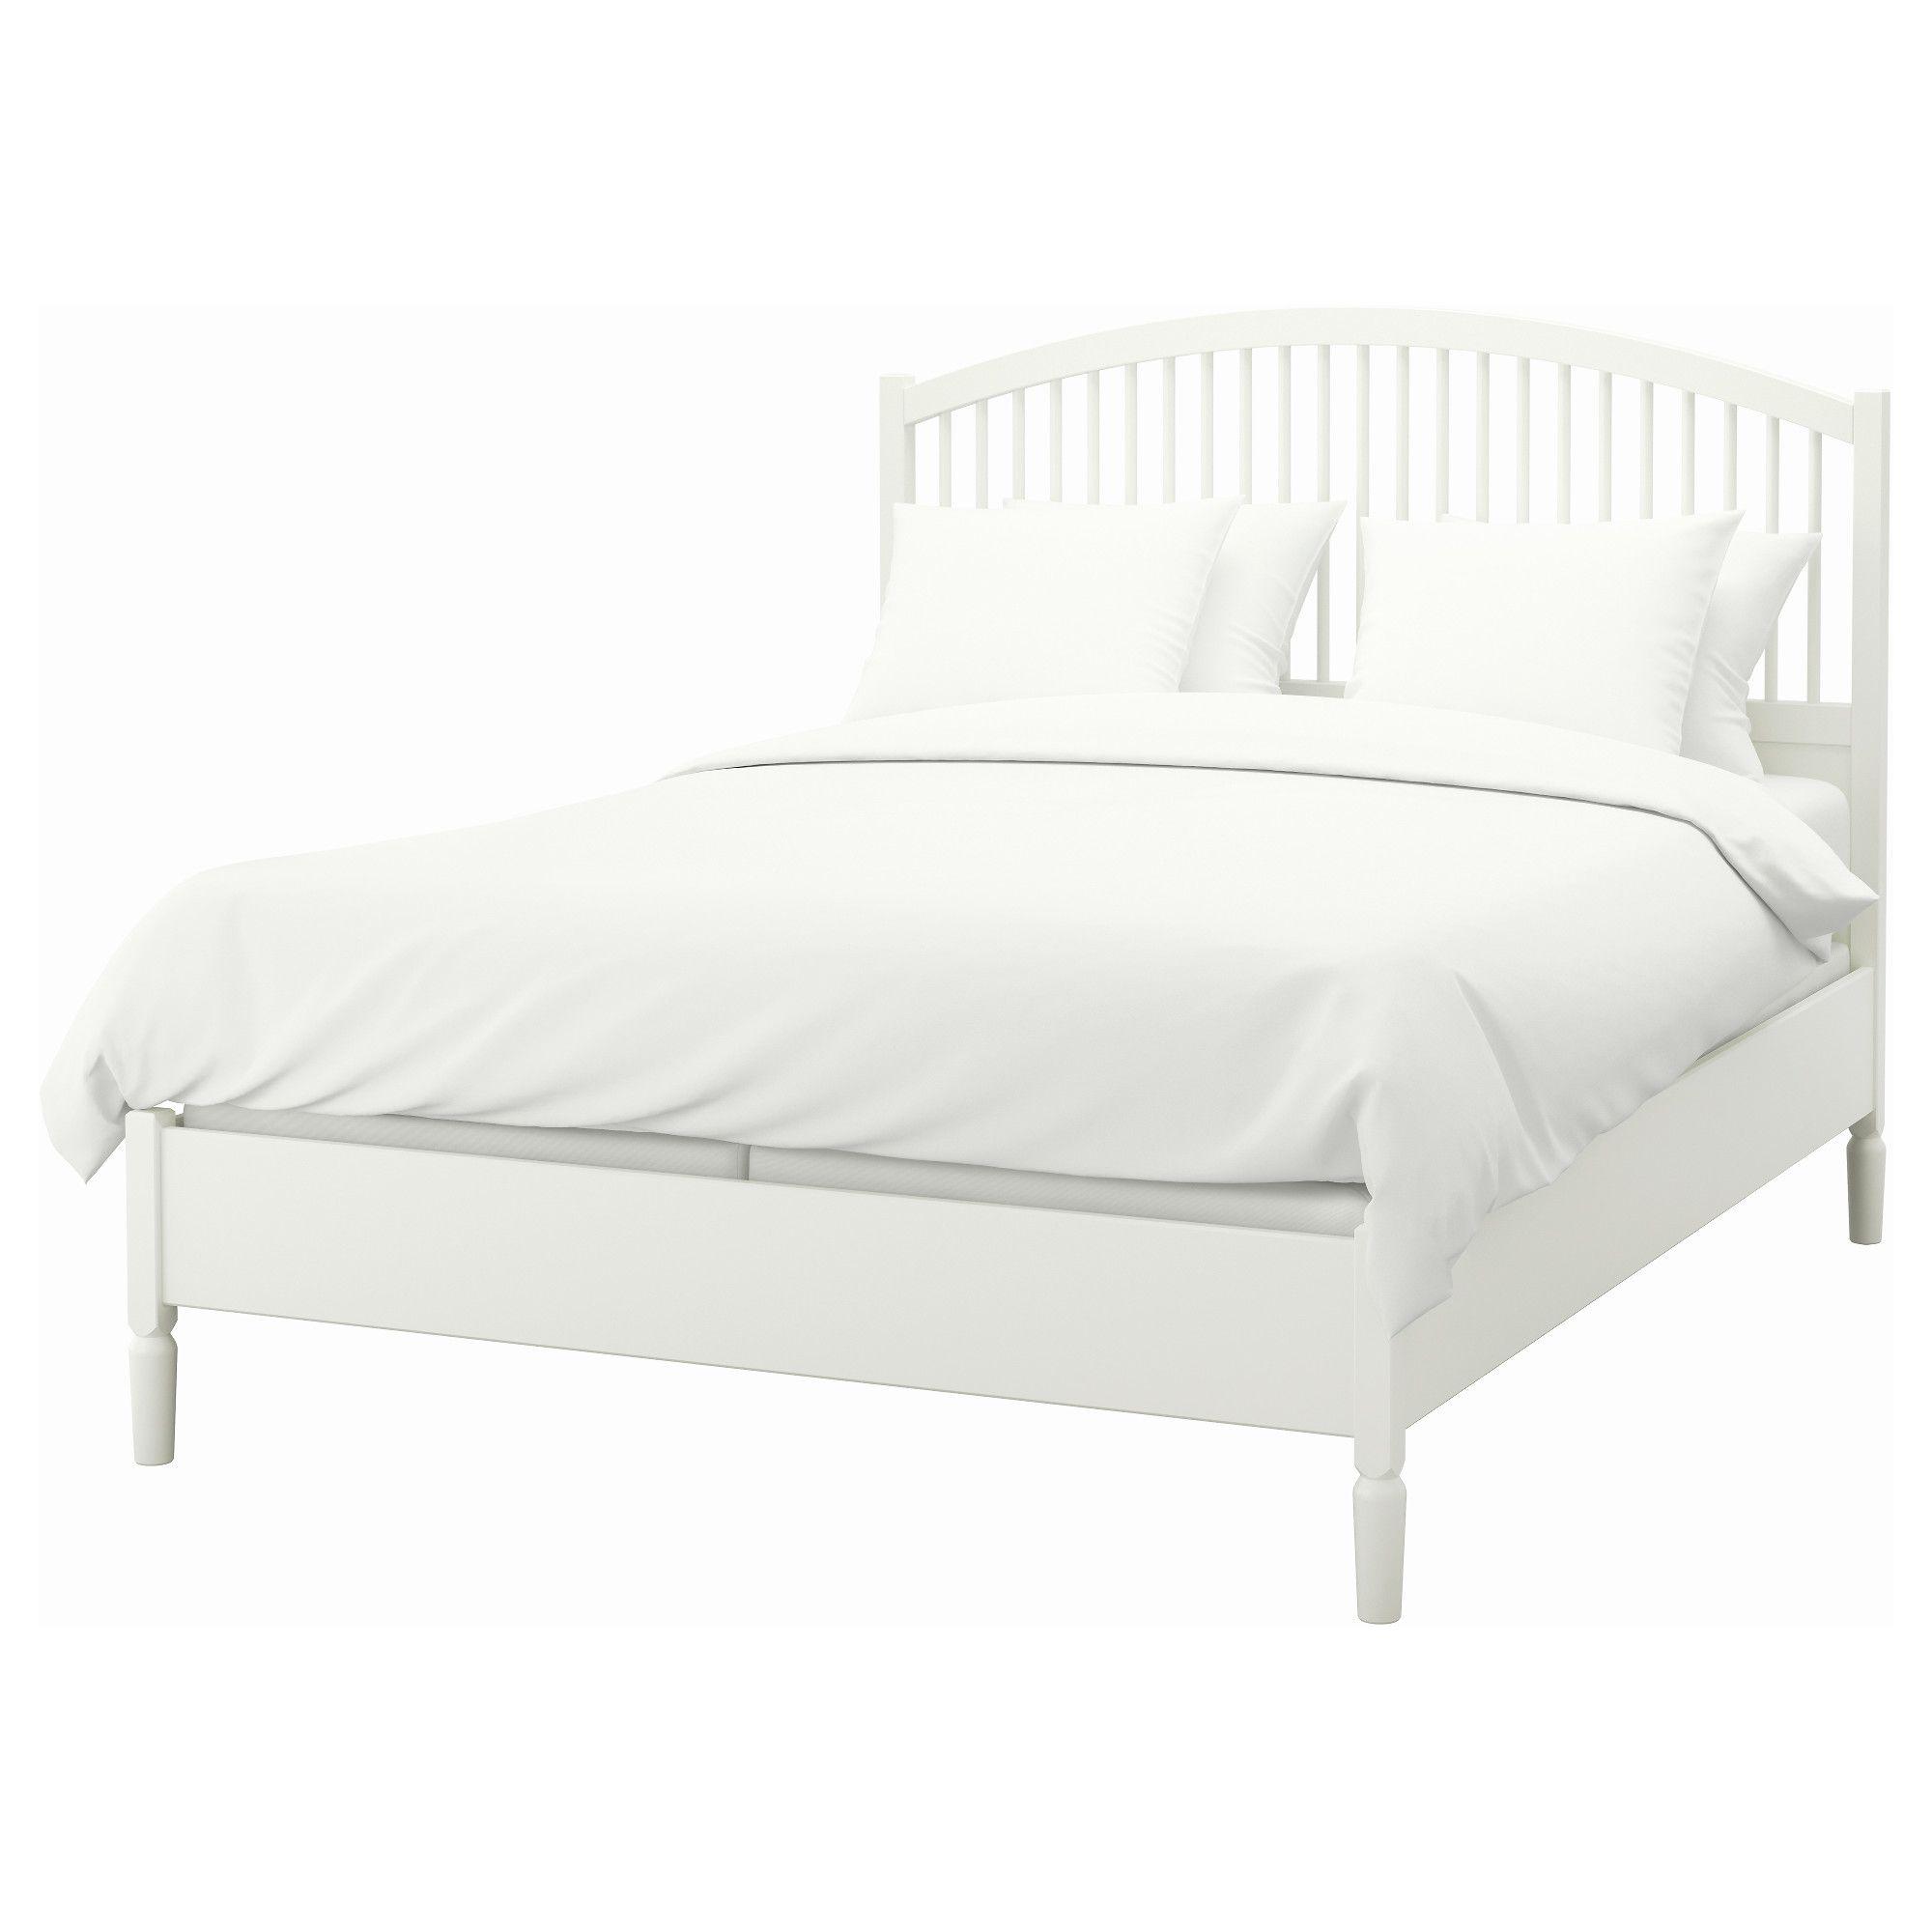 Tyssedal Bed Frame White Eidfjord Queen Bed Frame King Size